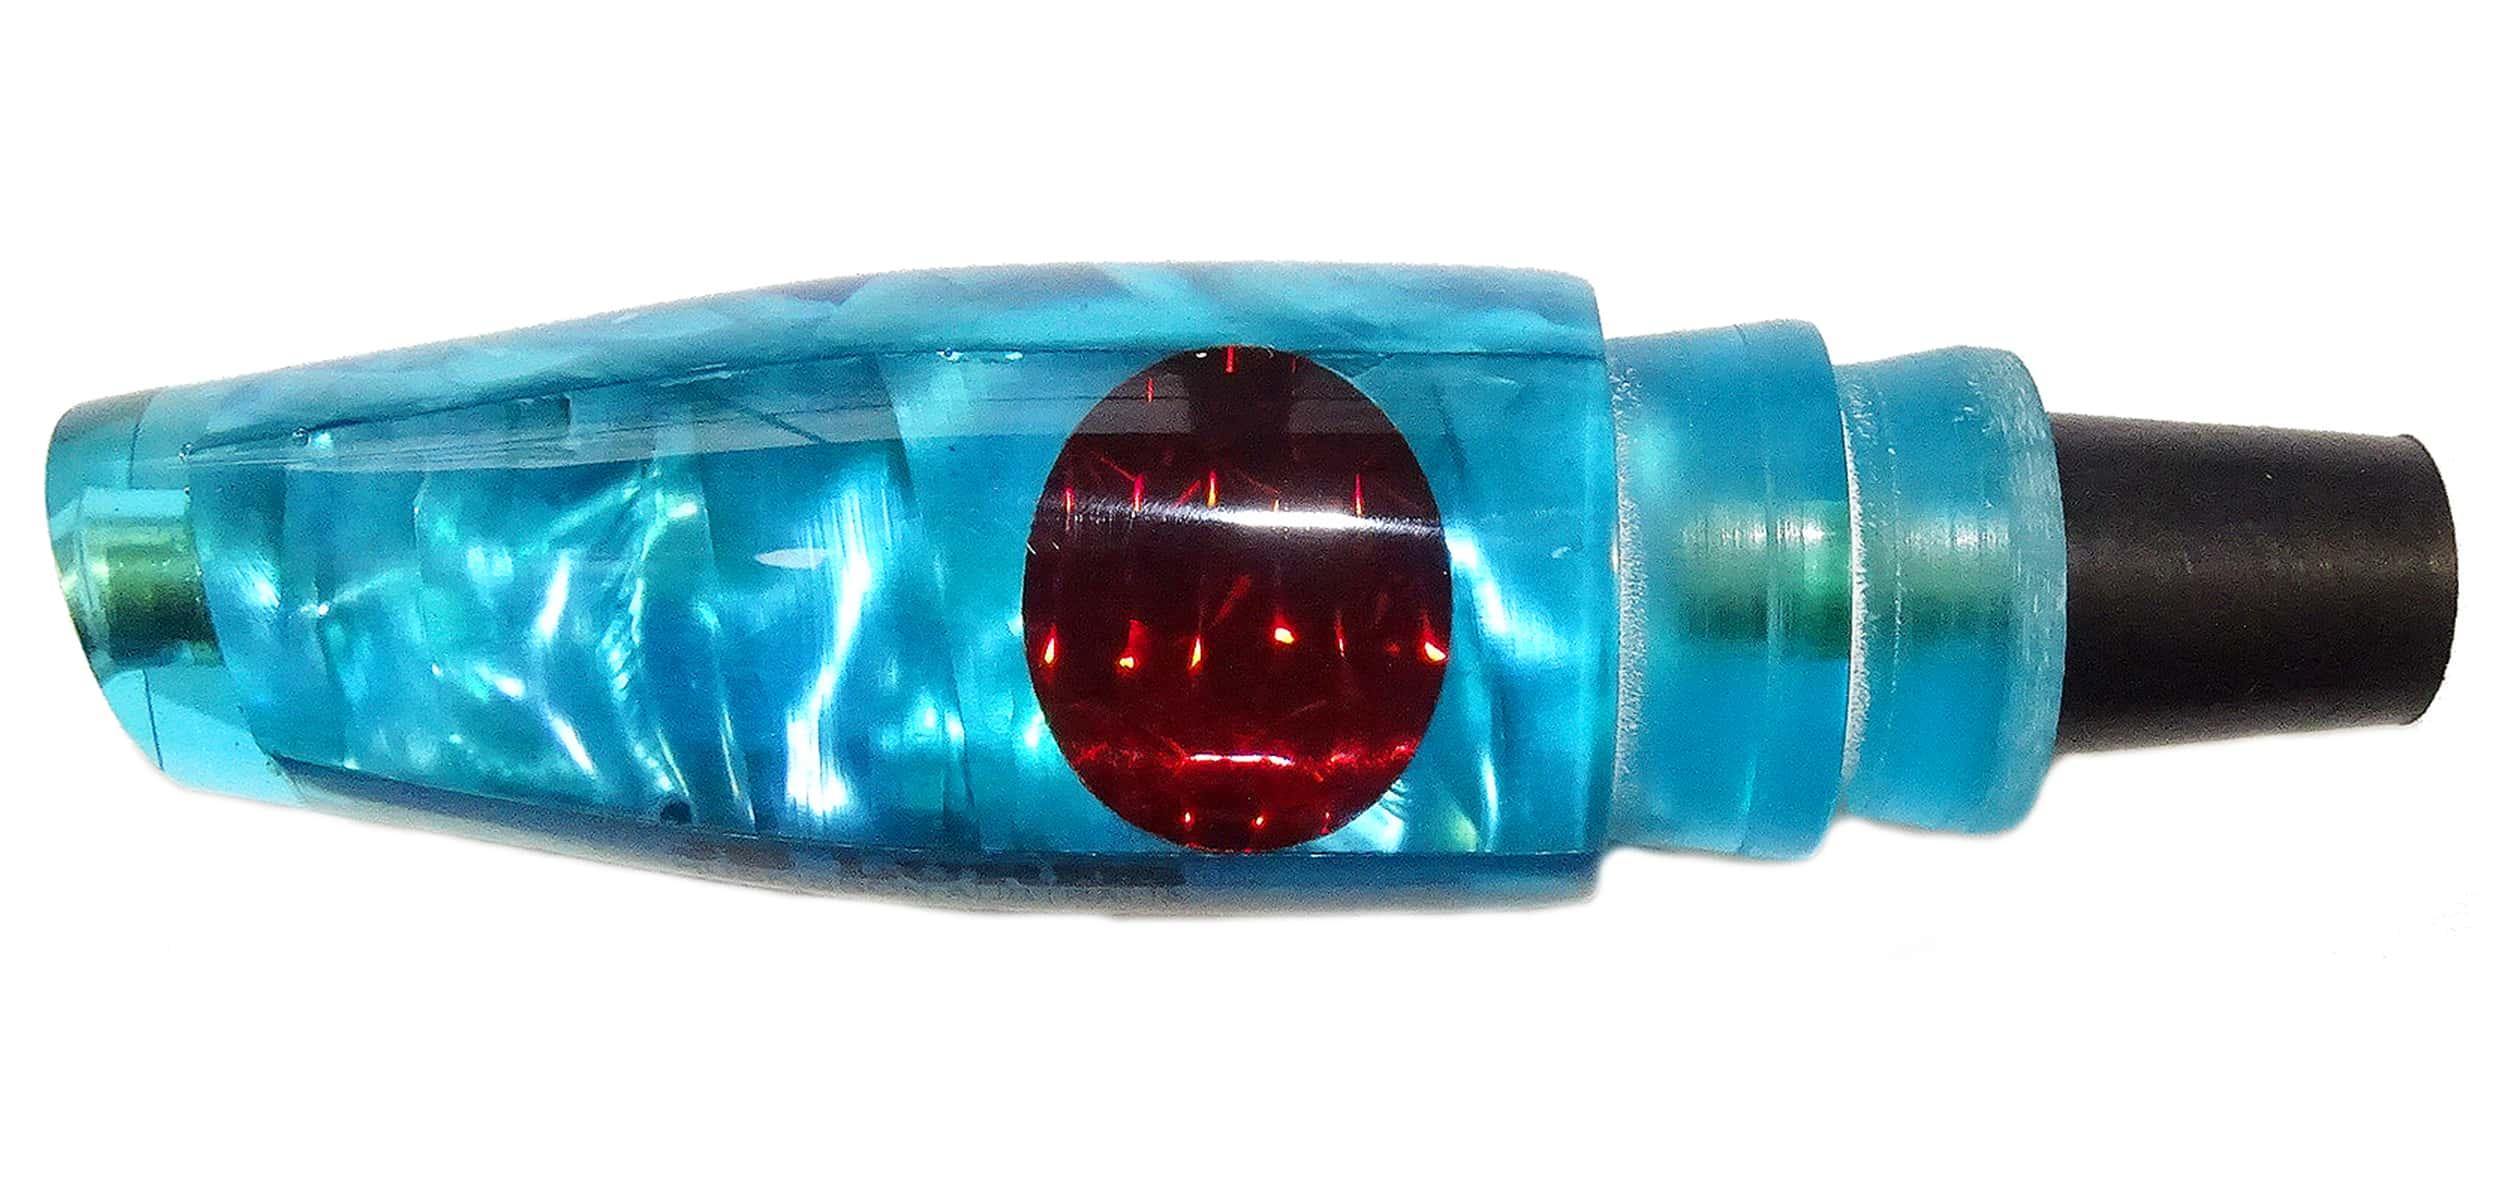 JB Lures - Pluto Series - Head - Fluoro Blue Silver Lip Shell